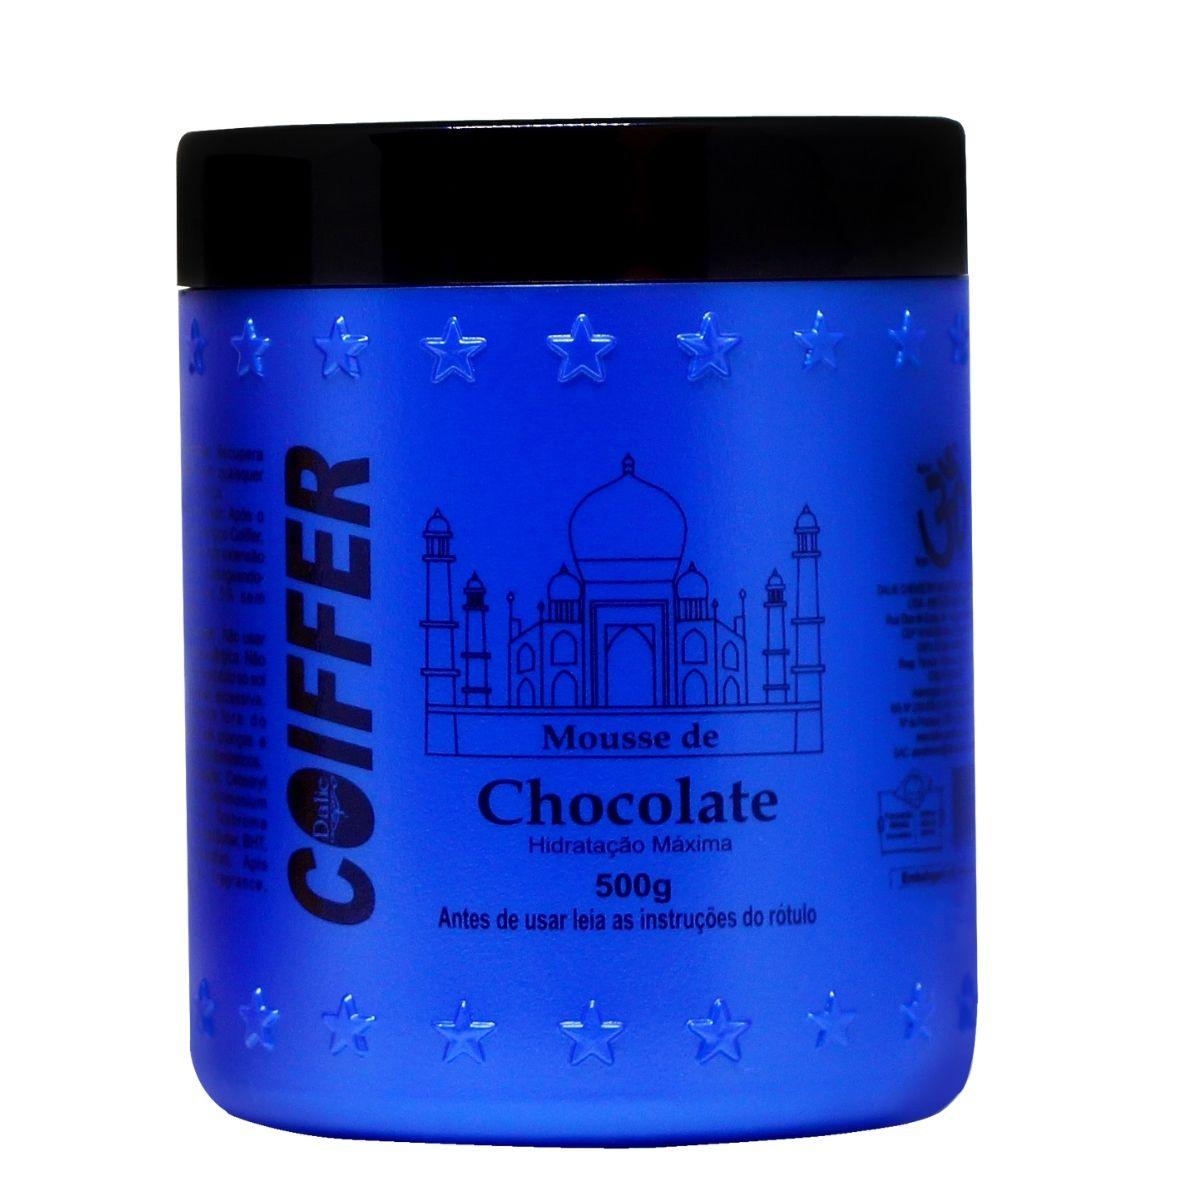 Mascara Capilar Mousse de Chocolate Coiffer 500g